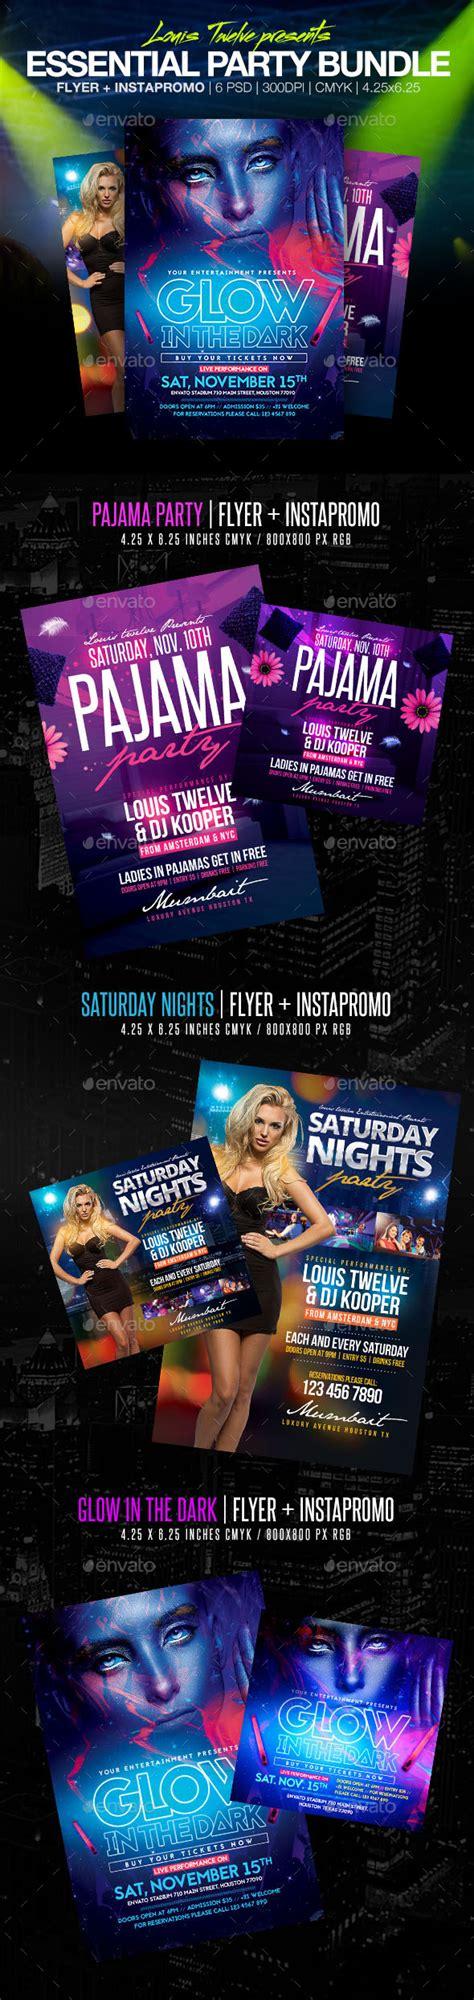 free party flyer templates for microsoft word telemontekg me